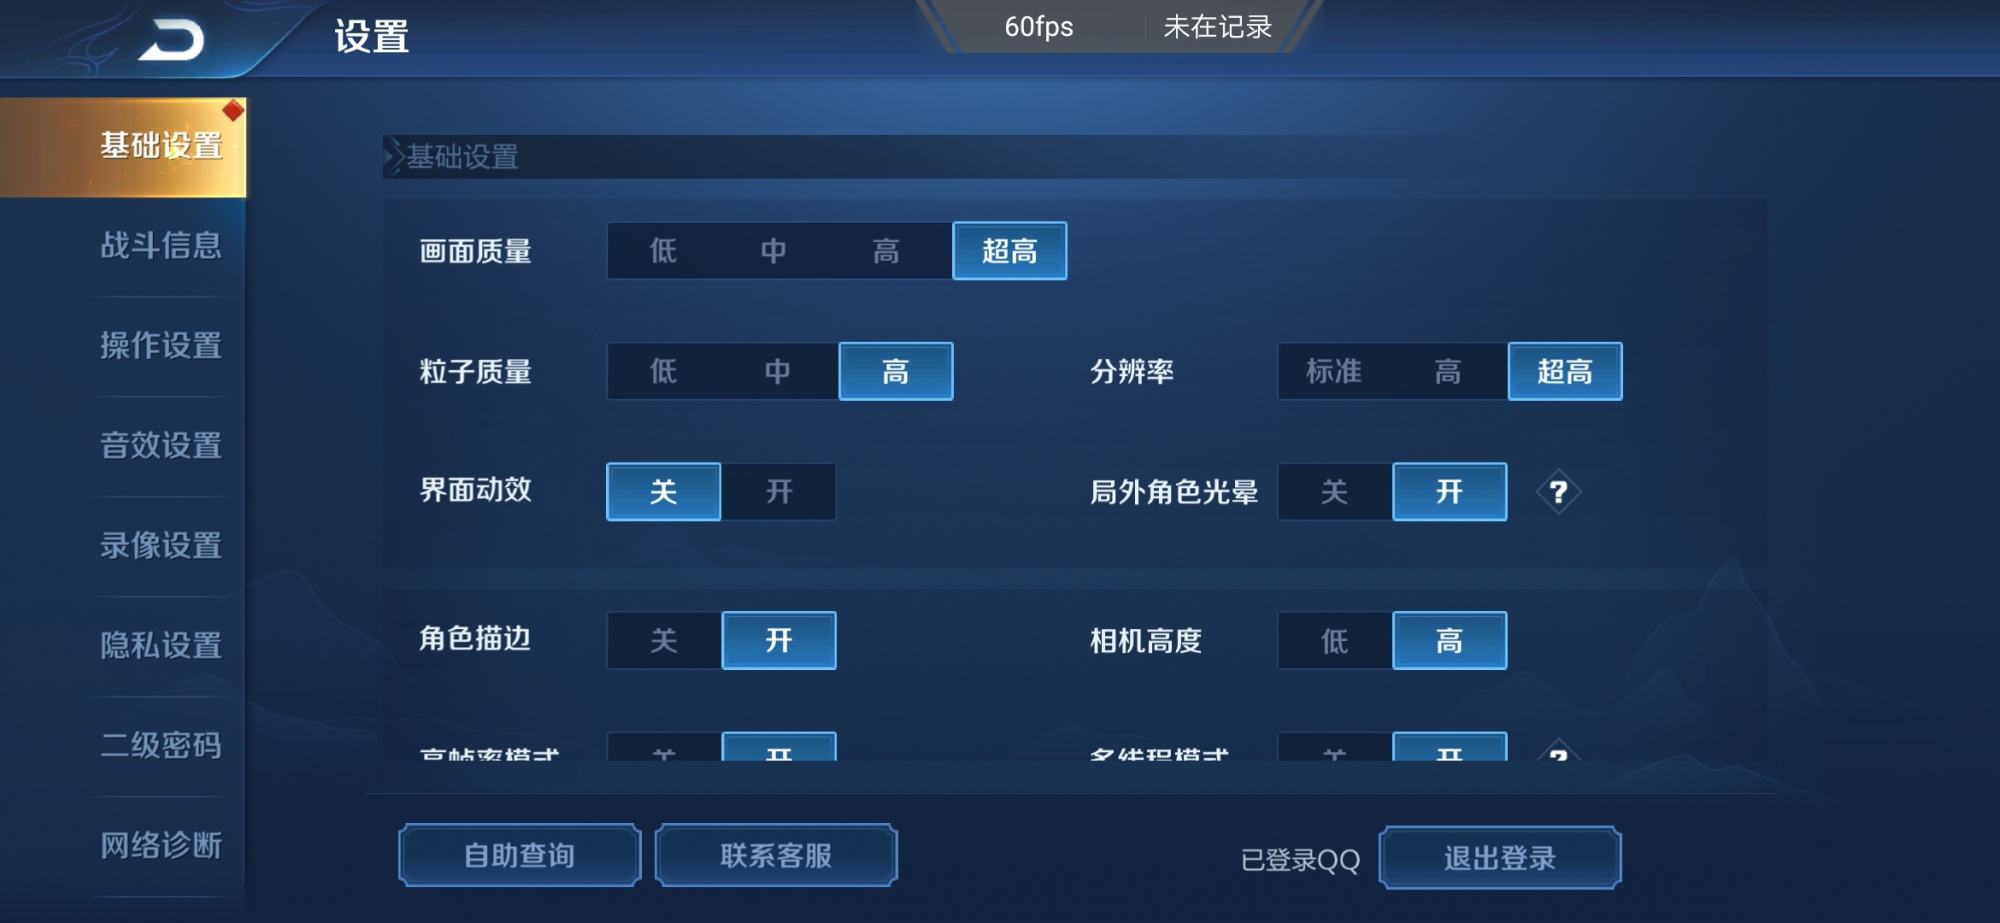 Screenshot_20190920_122103_com.tencent.tmgp.sgame.jpg